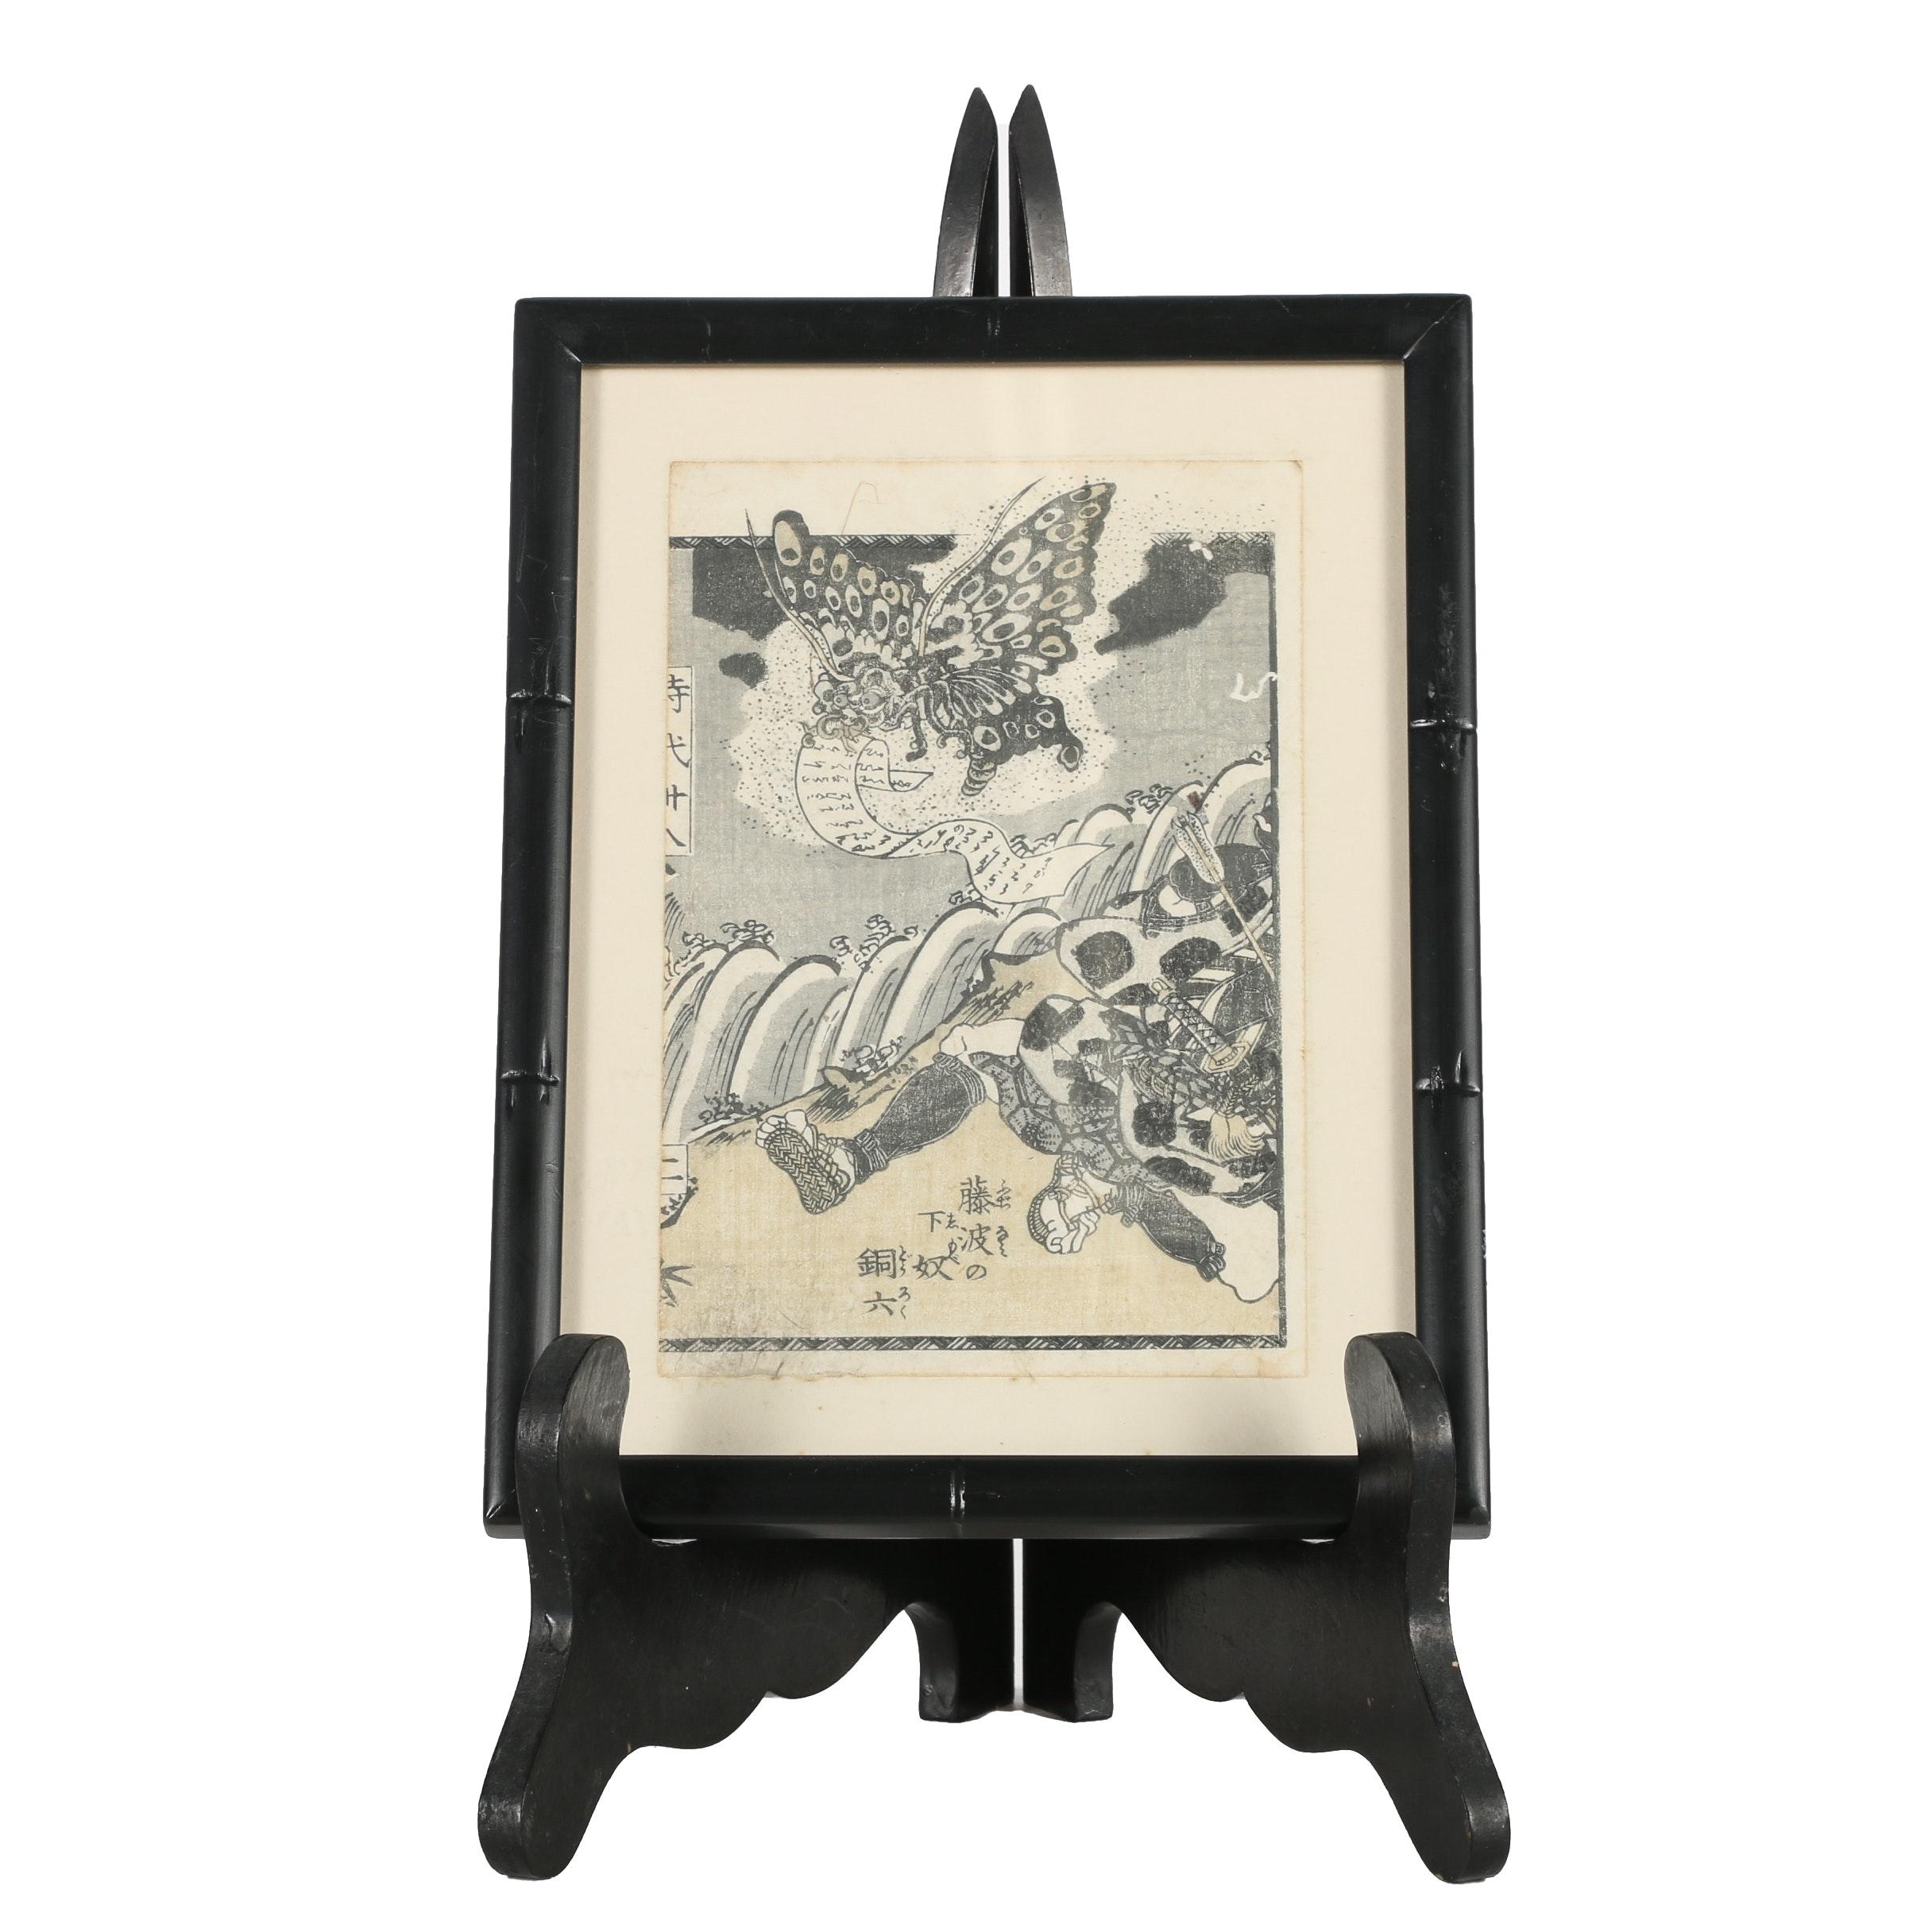 Japanese Woodblock Book Illustration Attributed to Utagawa Toyokuni III